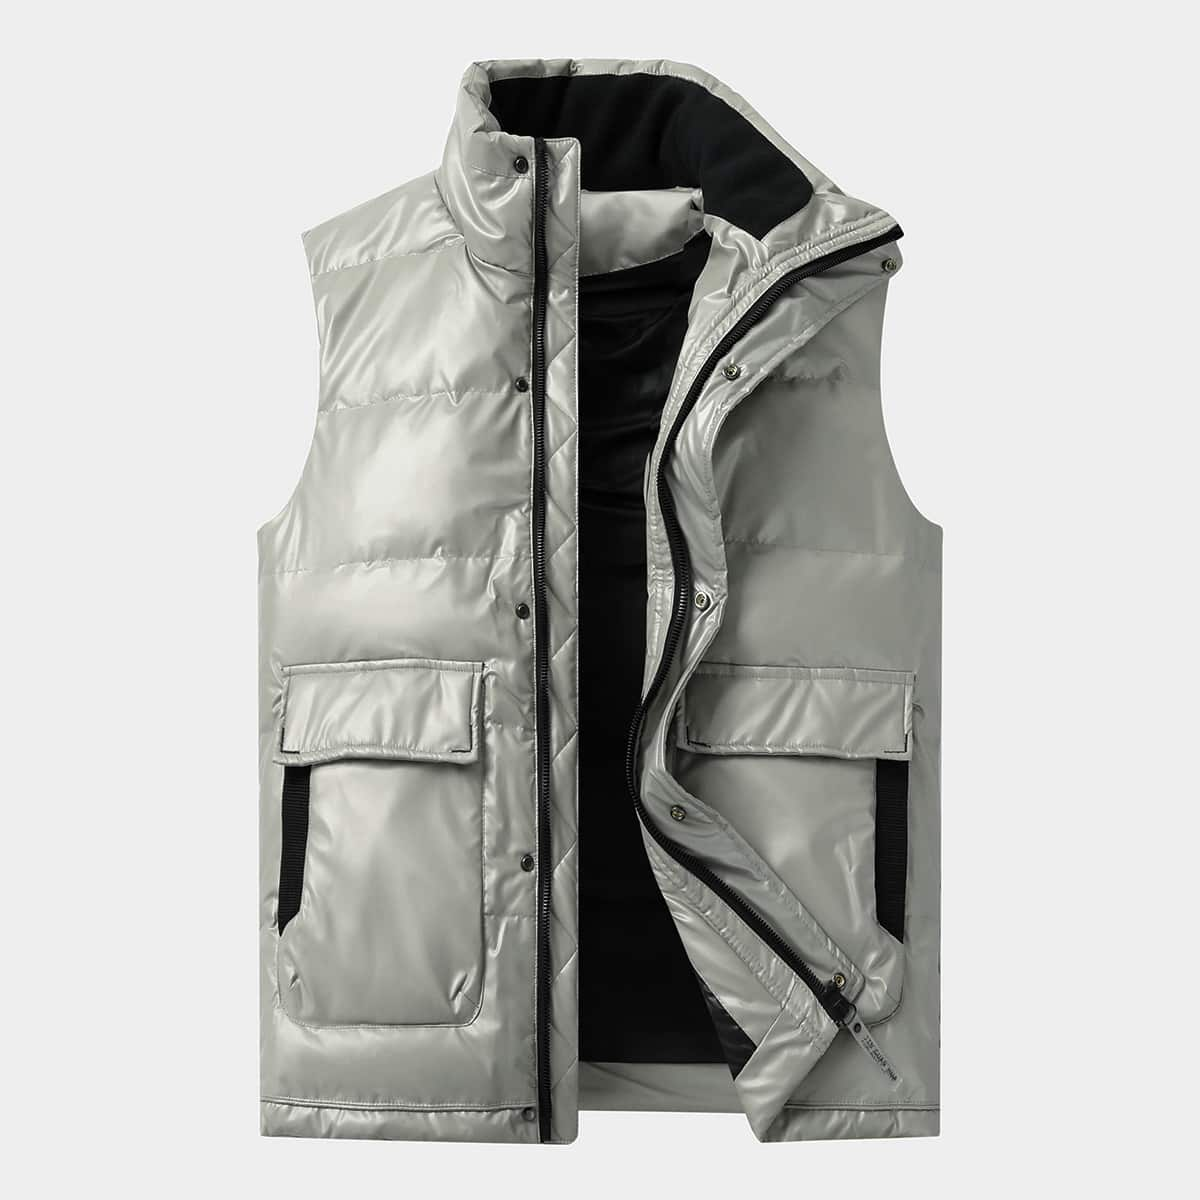 Мужской пуховой жилет на молнии с карманами от SHEIN